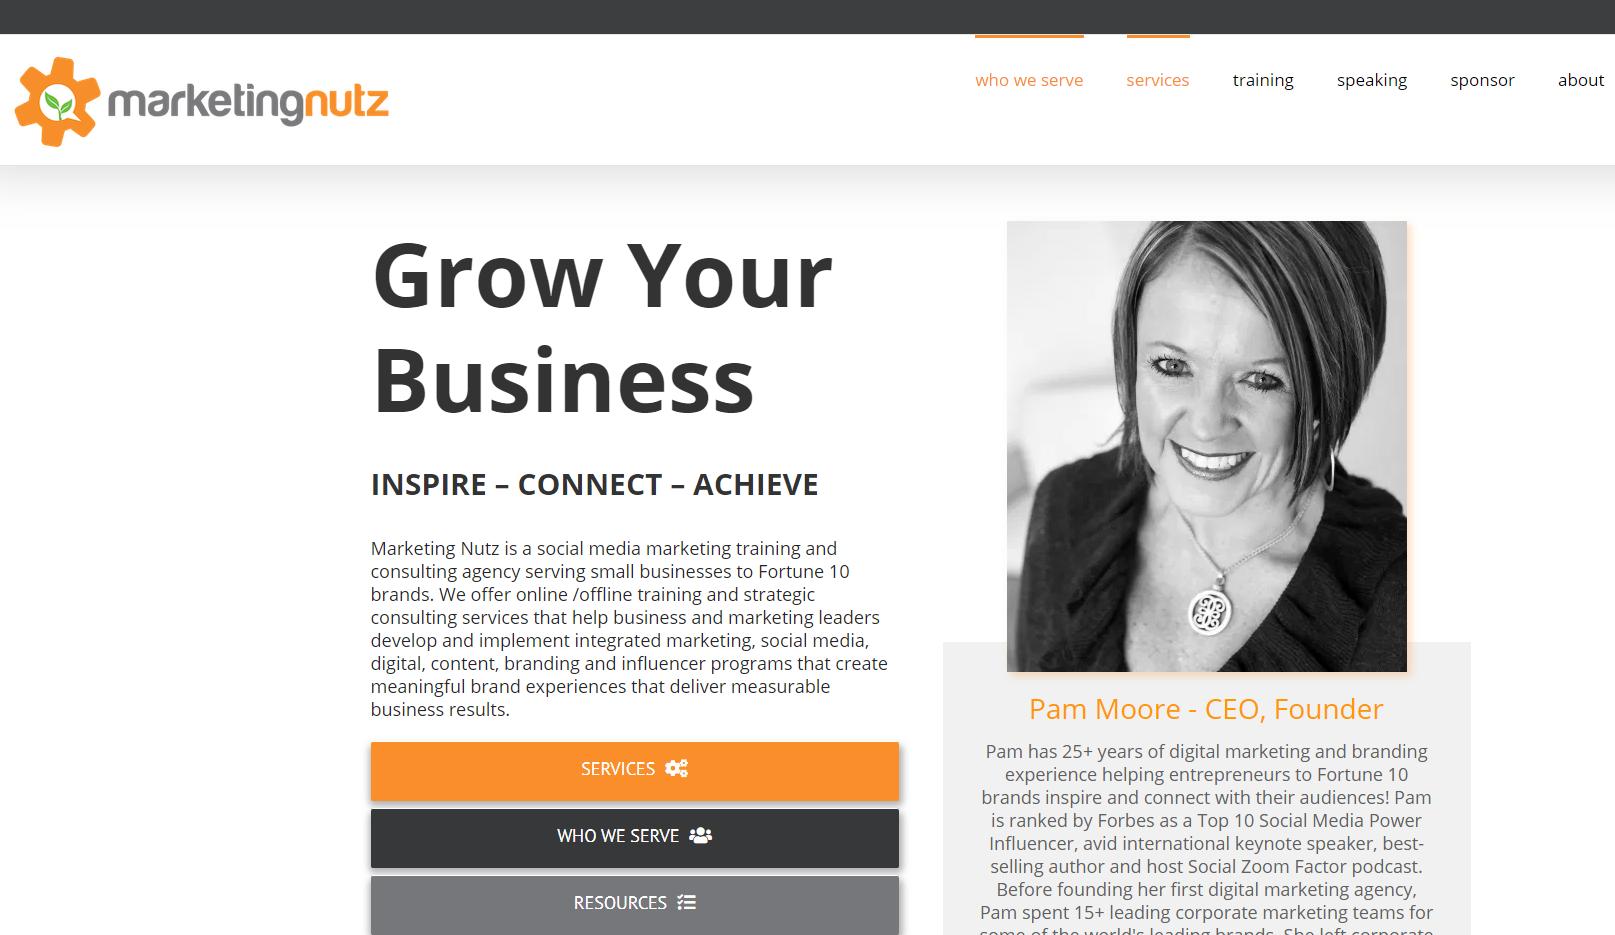 The Marketing Nutz Website